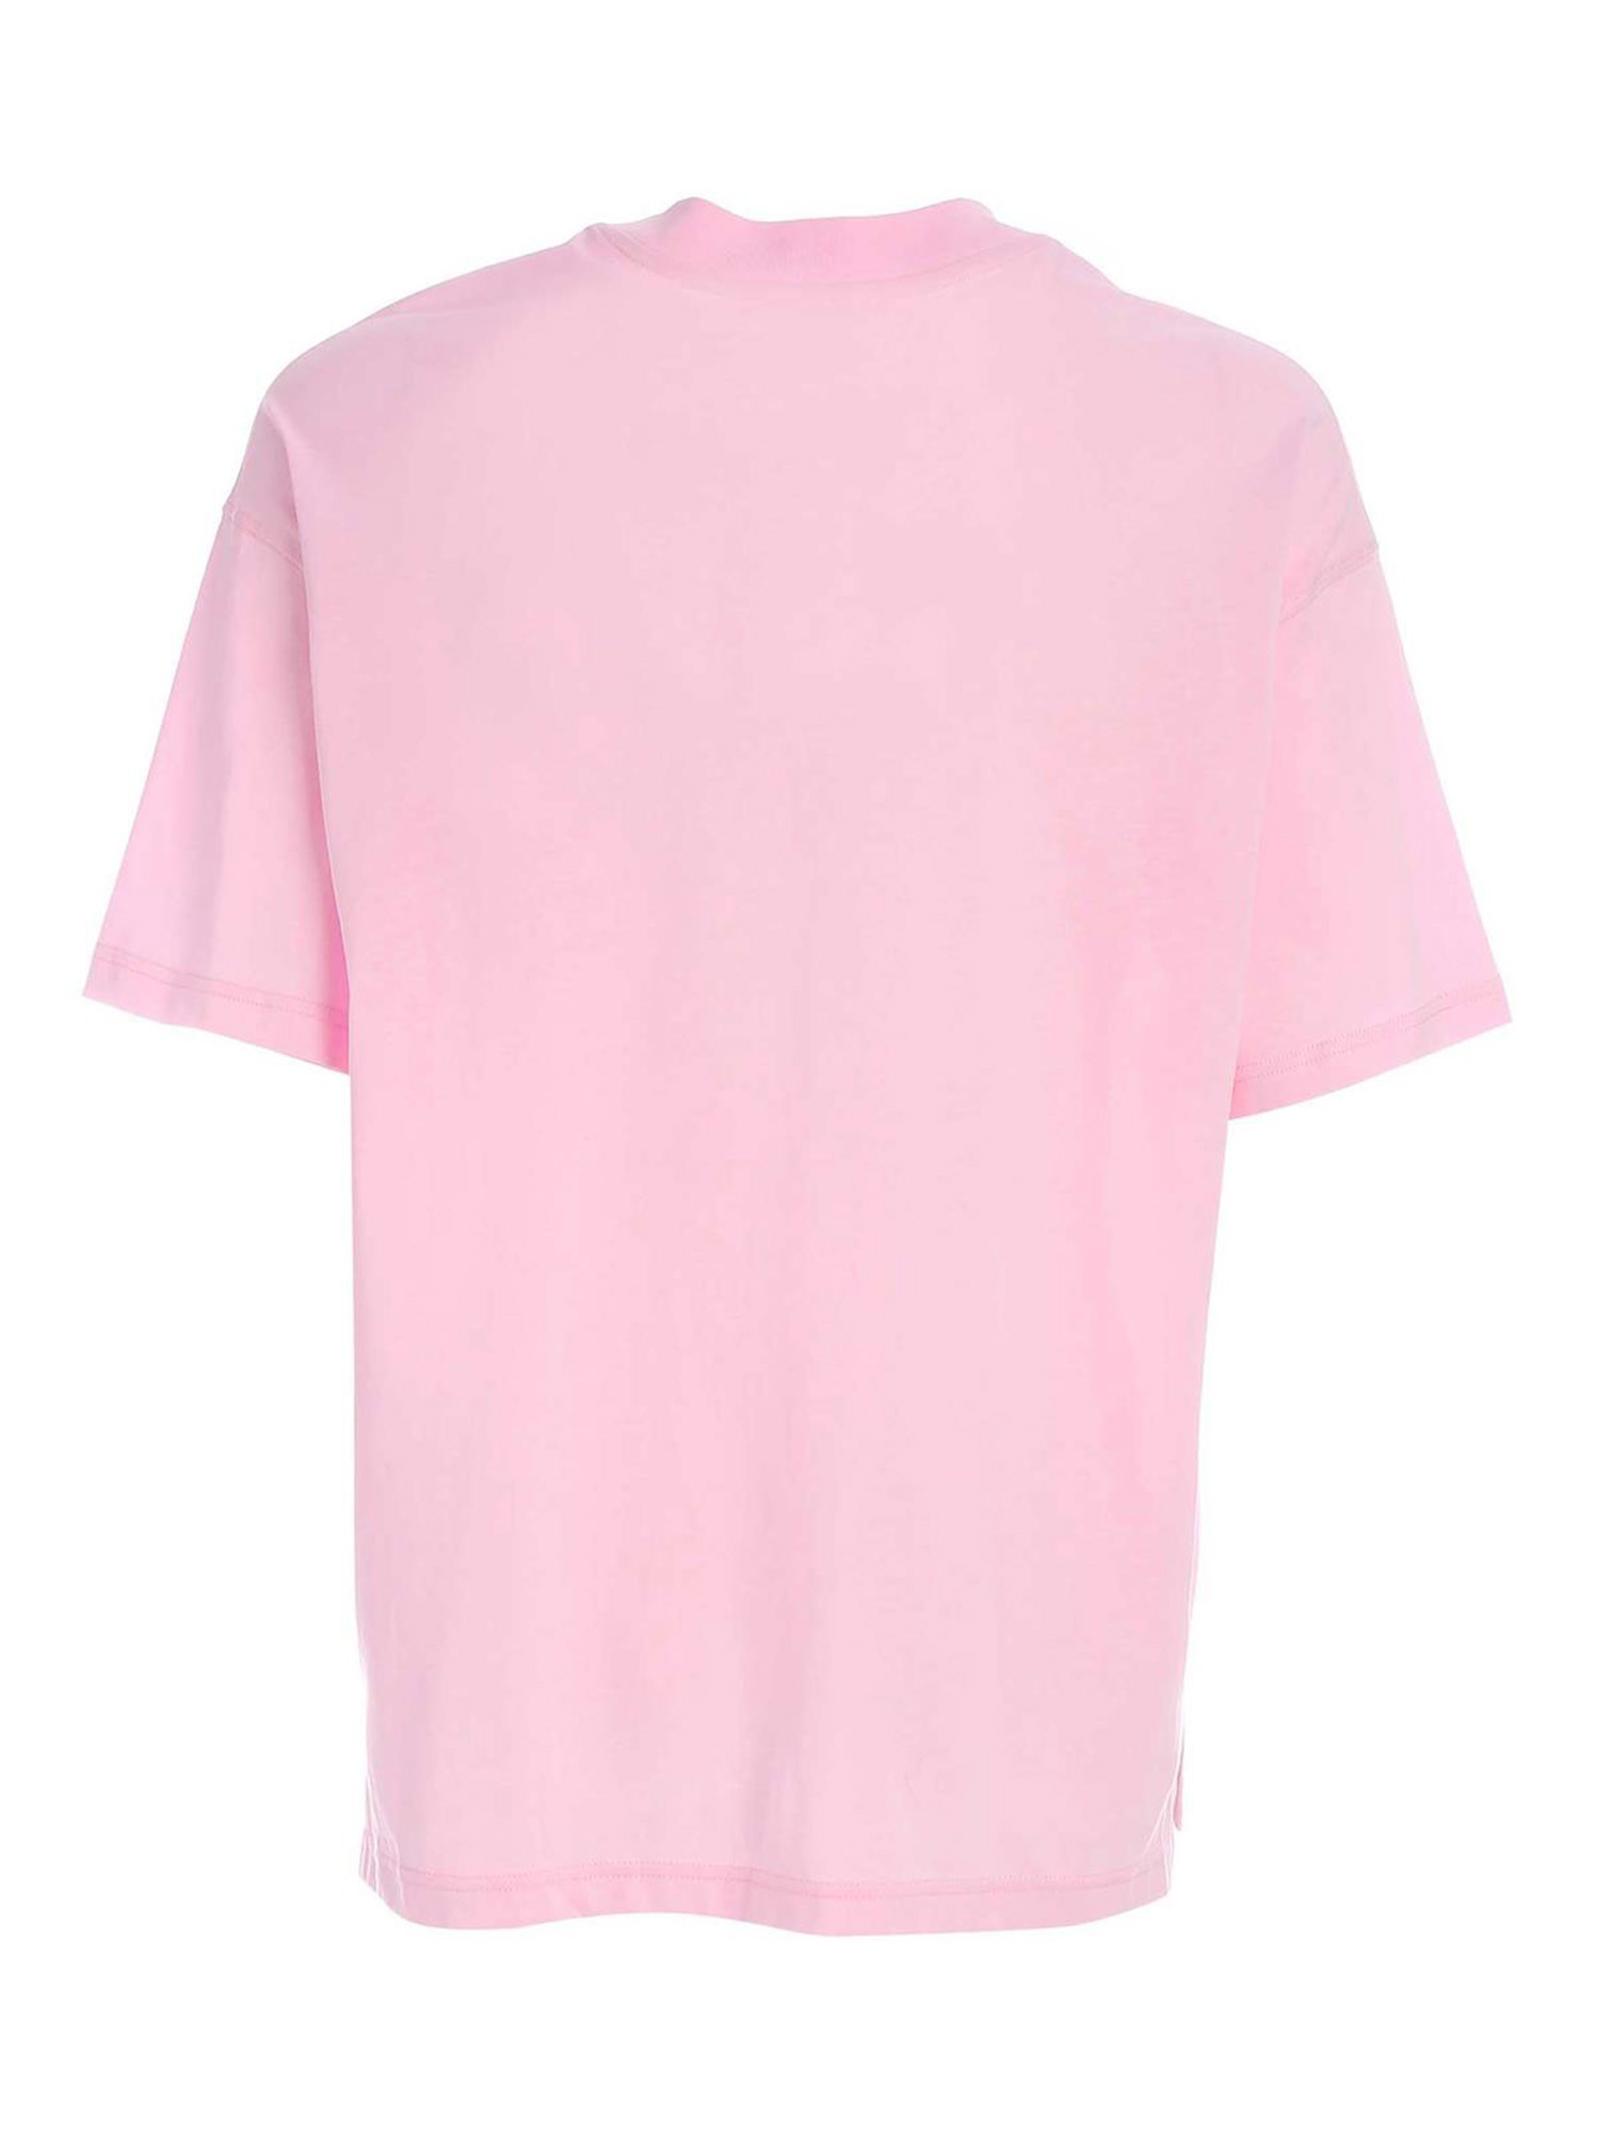 VERSACE JEANS | T-shirt | B3 GWA7TM30319 O21